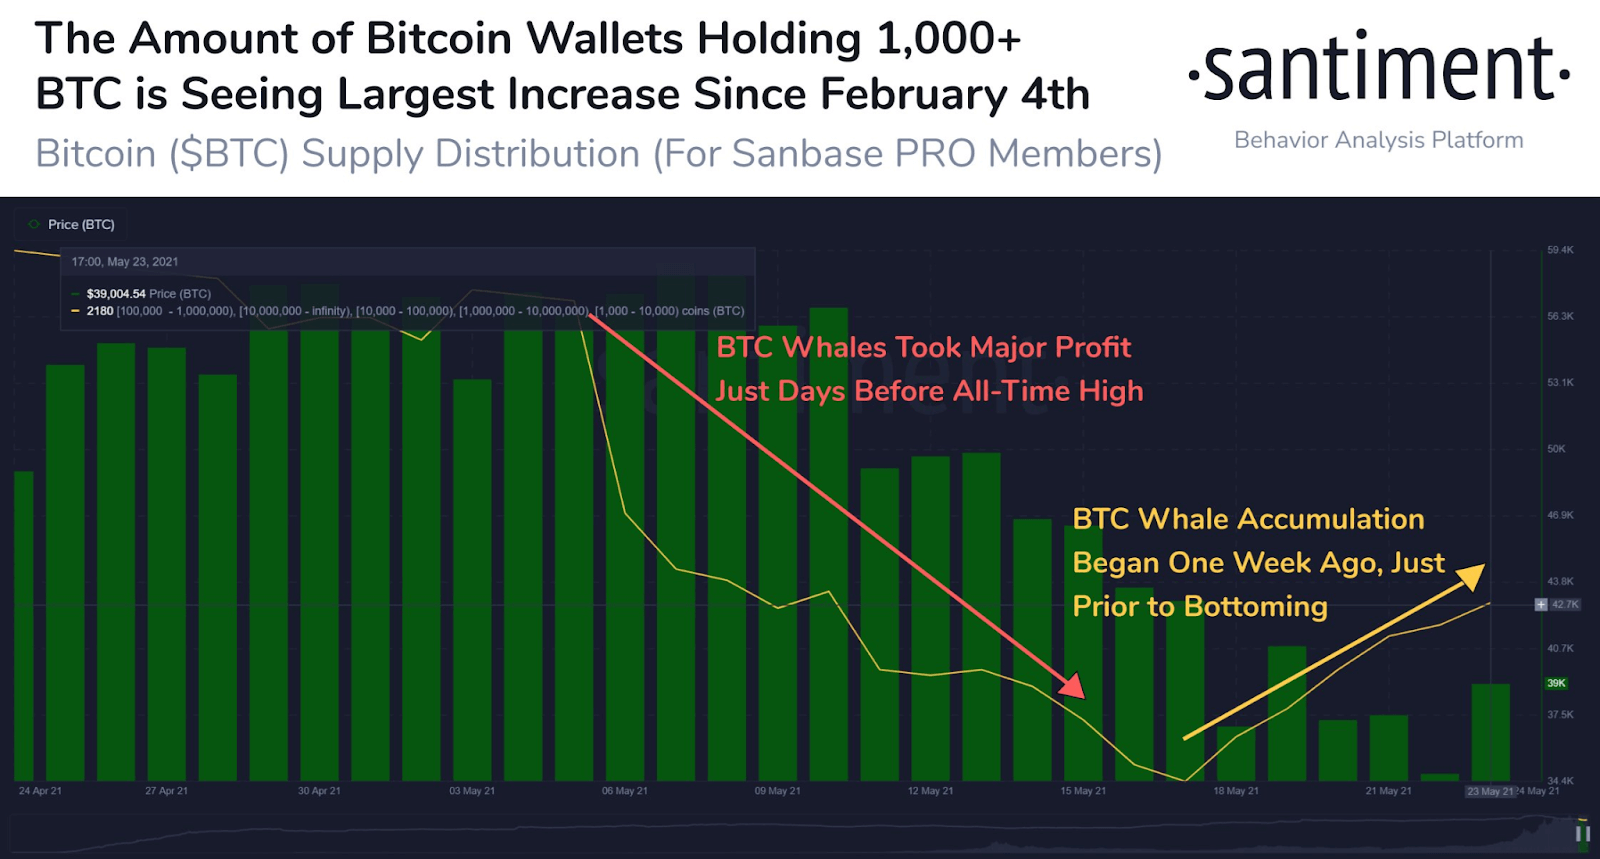 BTC Wallets Holding 1,000+ BTC